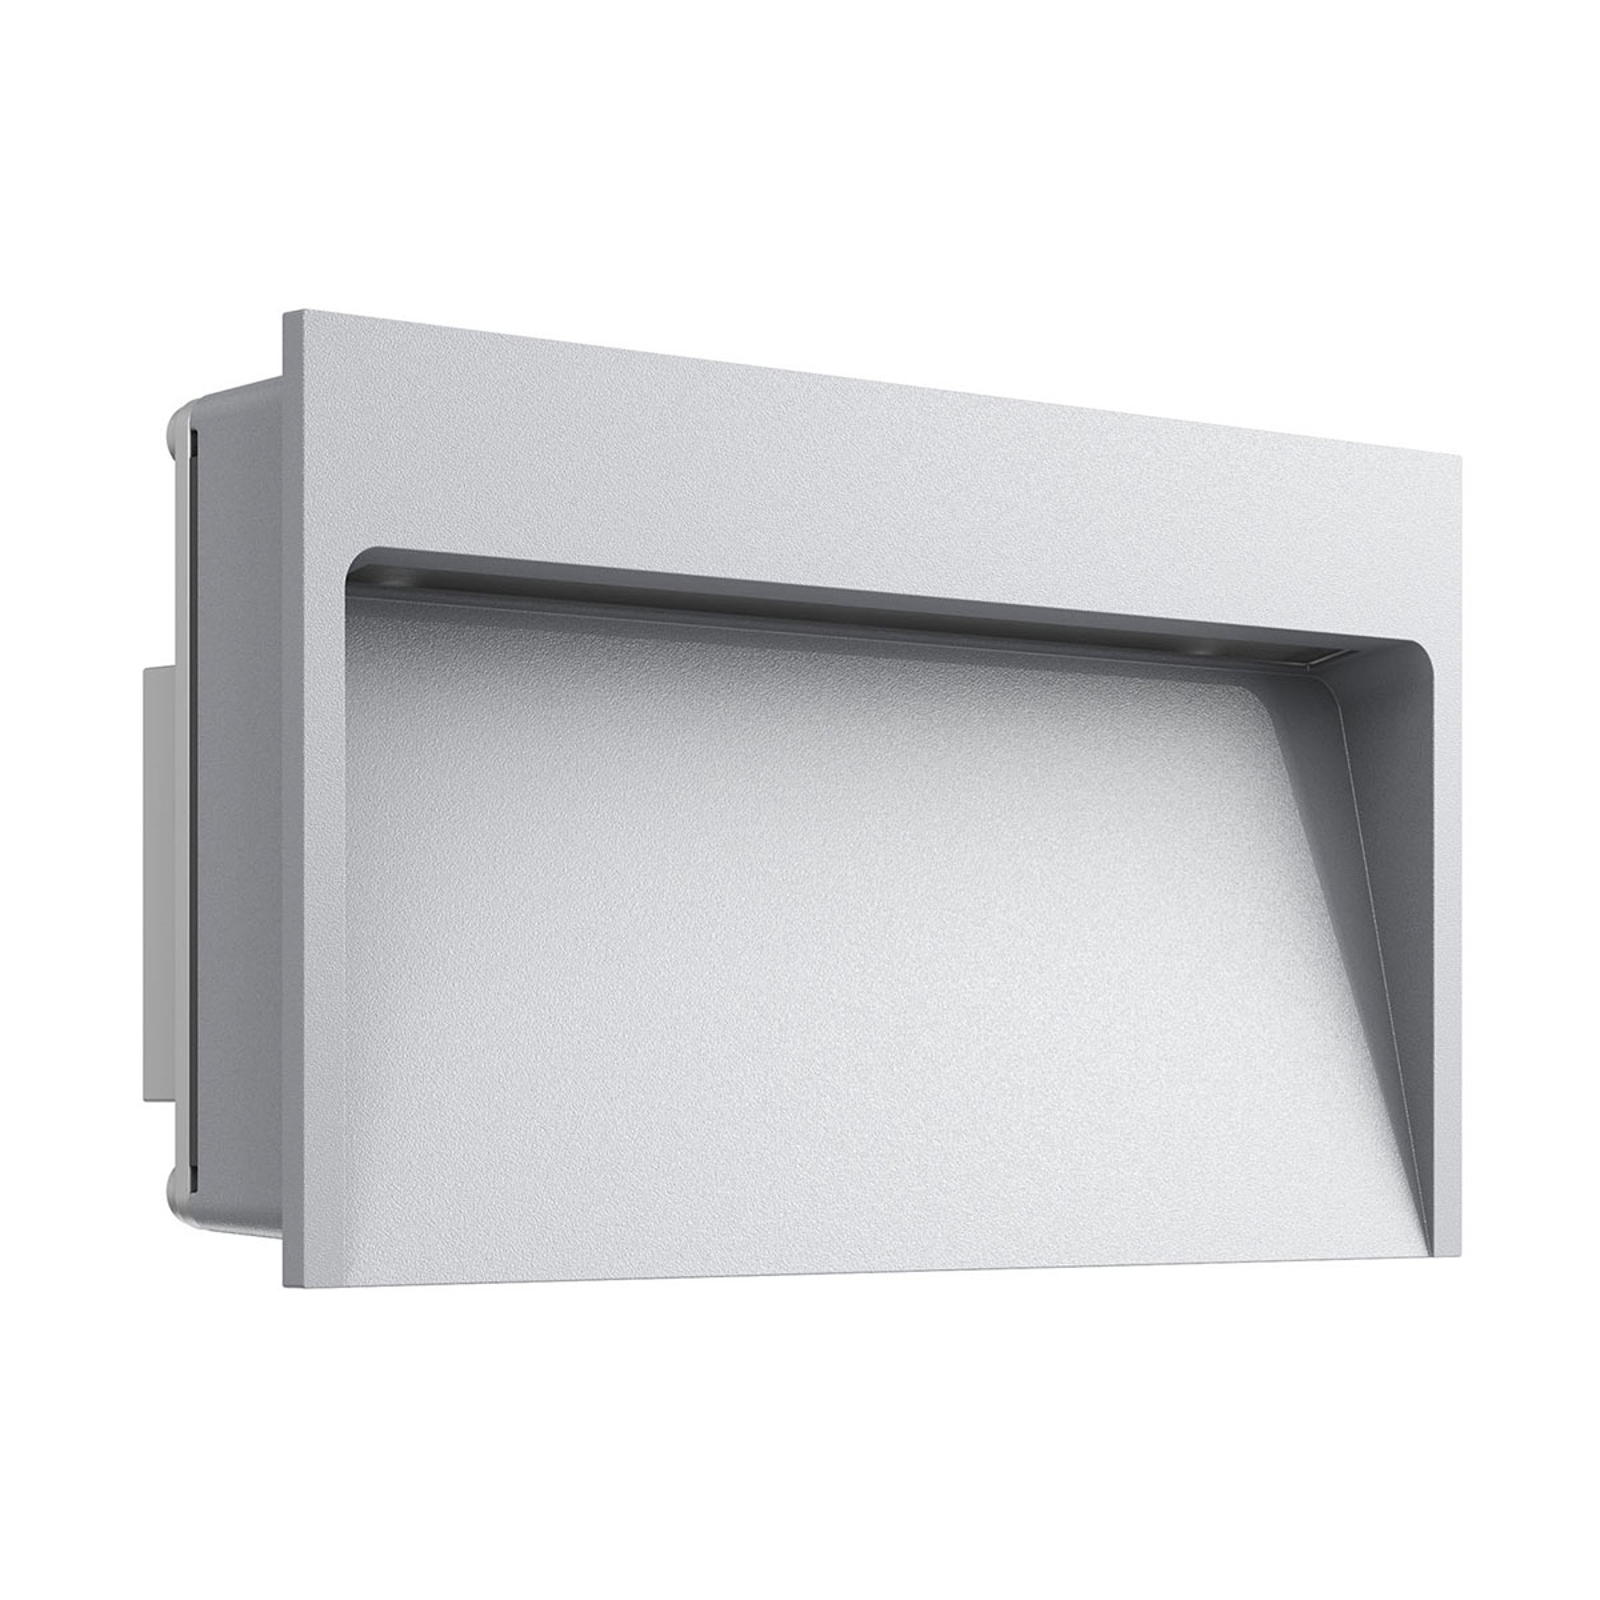 Bred innfelt LED vegglampe My Way, grå